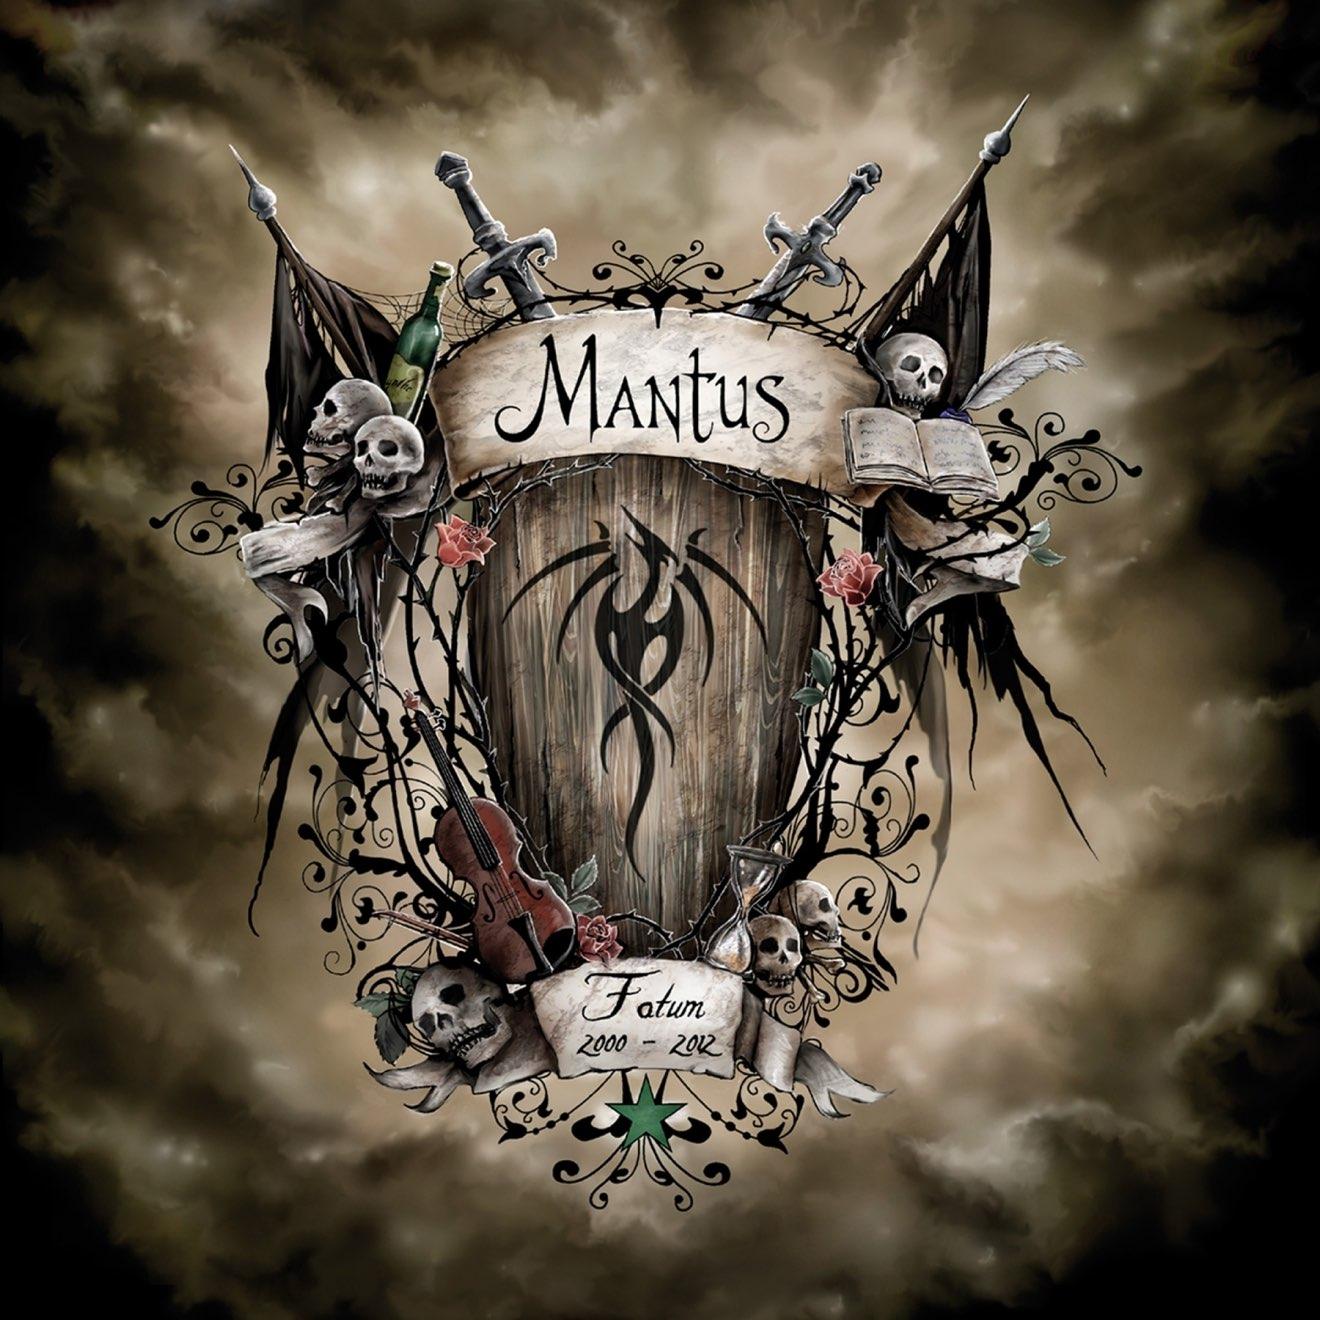 Mantus